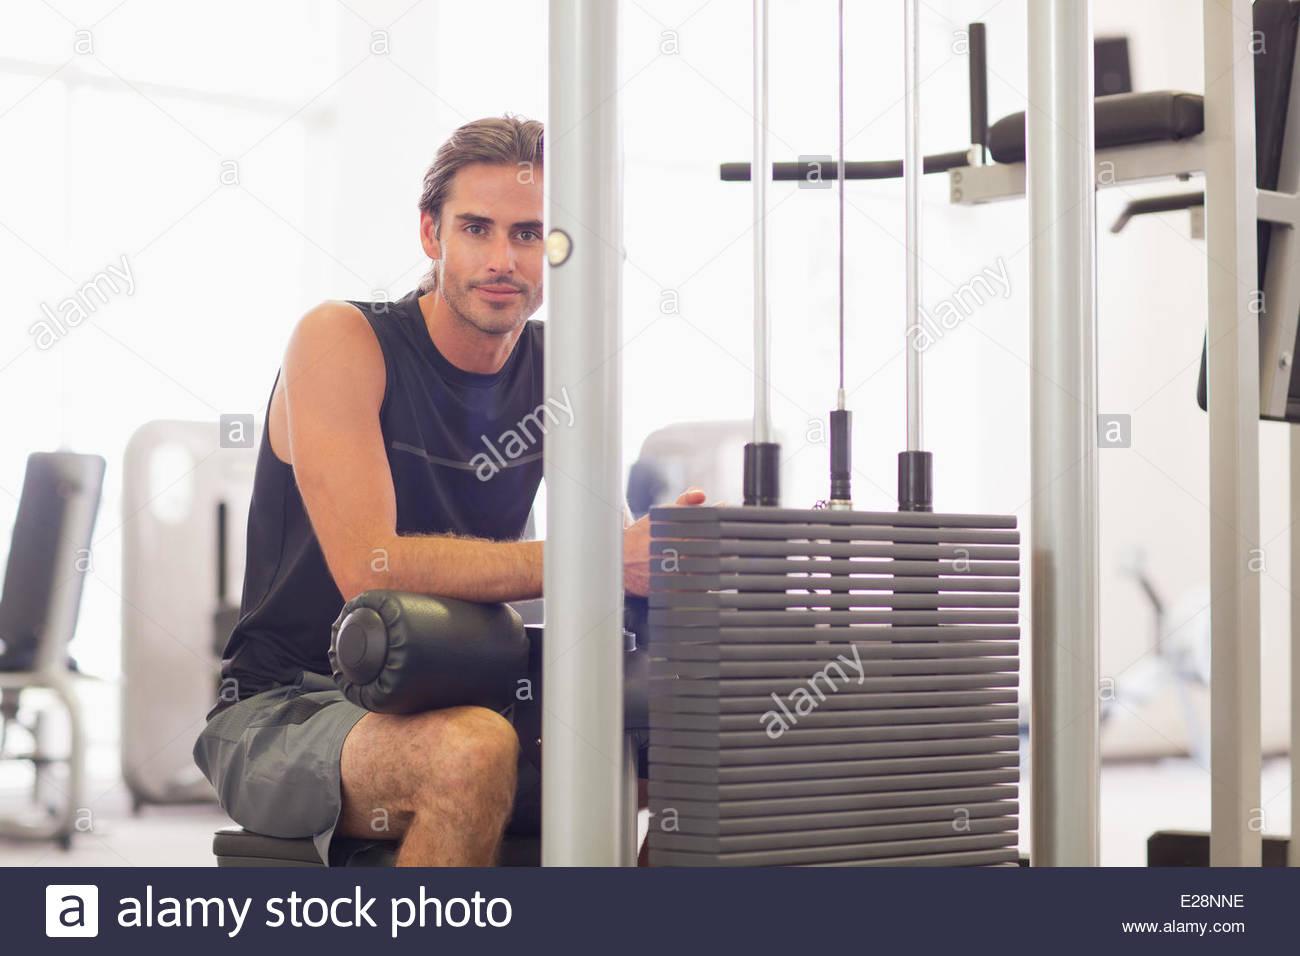 Portrait of smiling man using exercise equipment in gymnasium - Stock Image